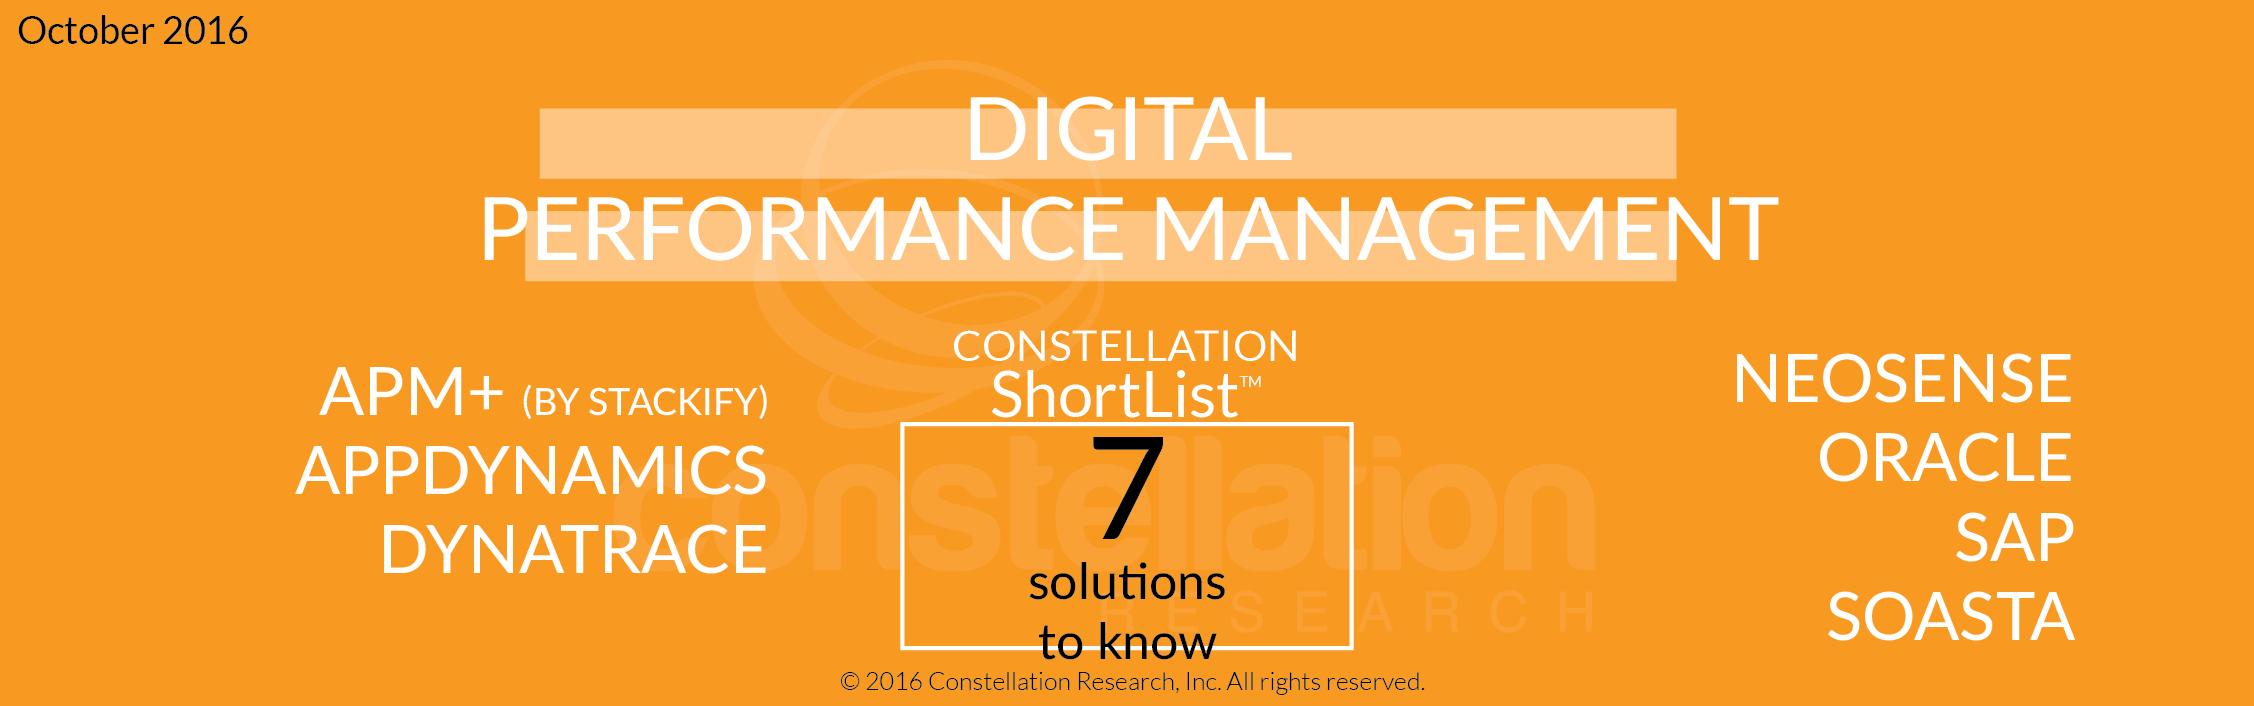 Constellation ShortList™ for Digital Performance Management